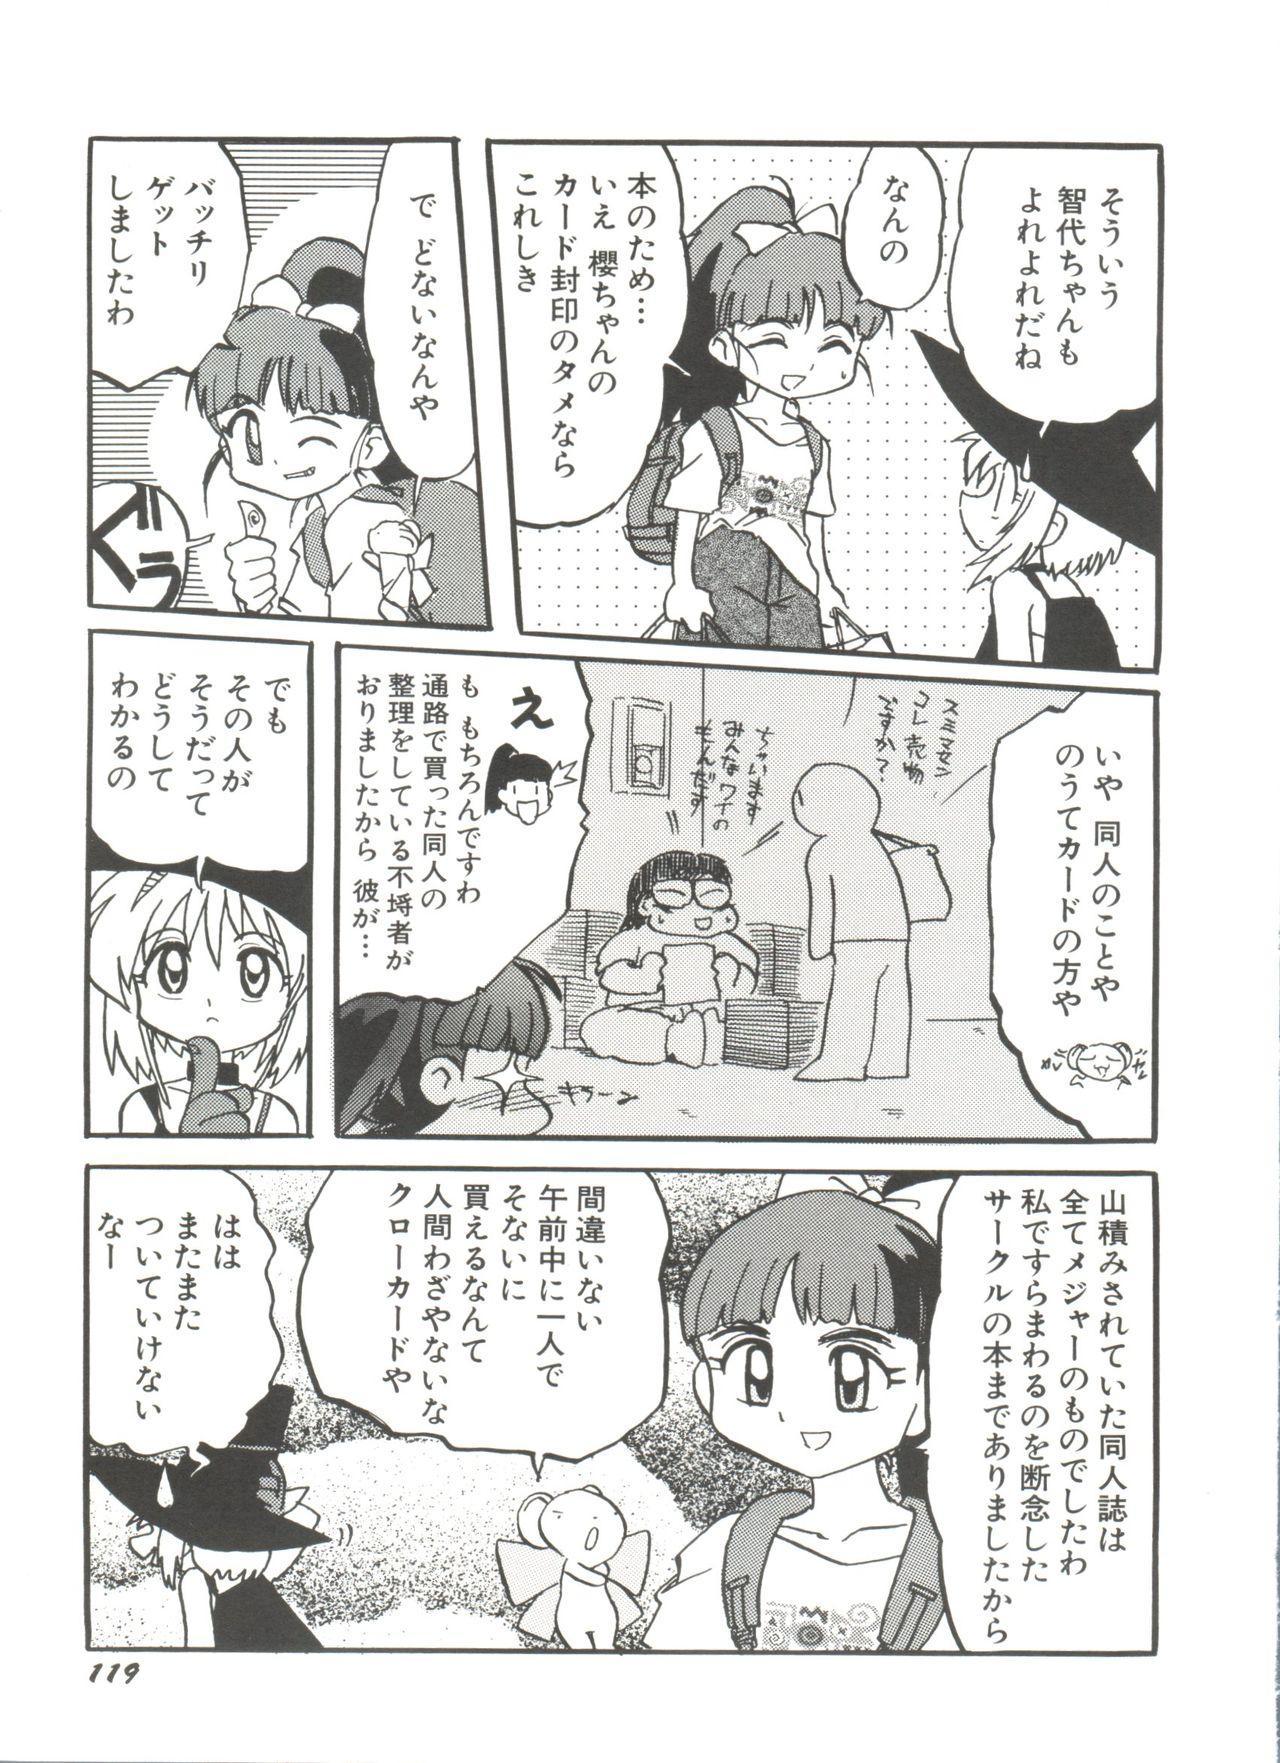 [Anthology] Denei Tamatebako 8 - Utakata no Tenshi-tachi II (Various) 120